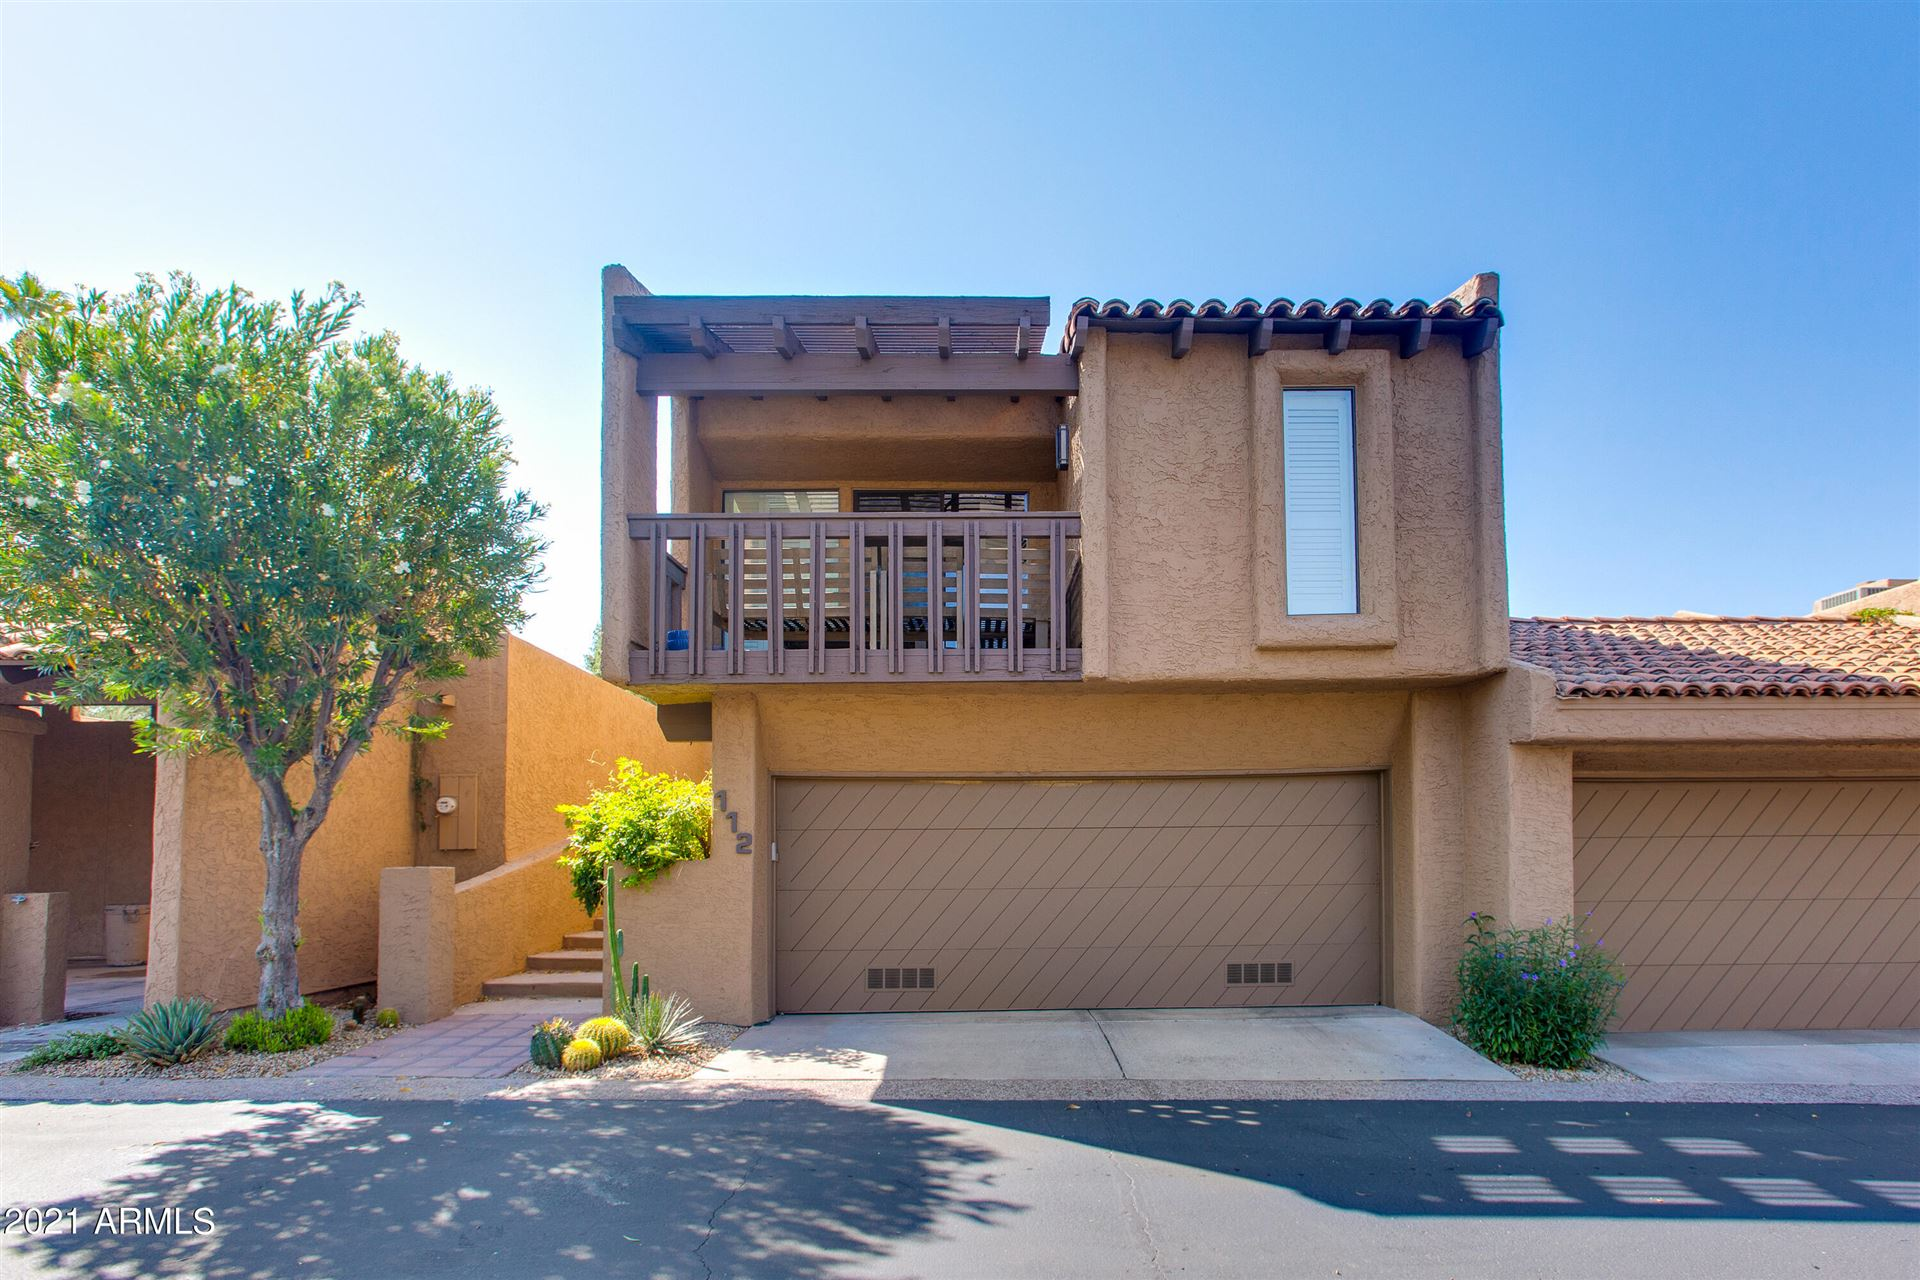 4446 E CAMELBACK Road #112, Phoenix, AZ 85018 - MLS#: 6299208